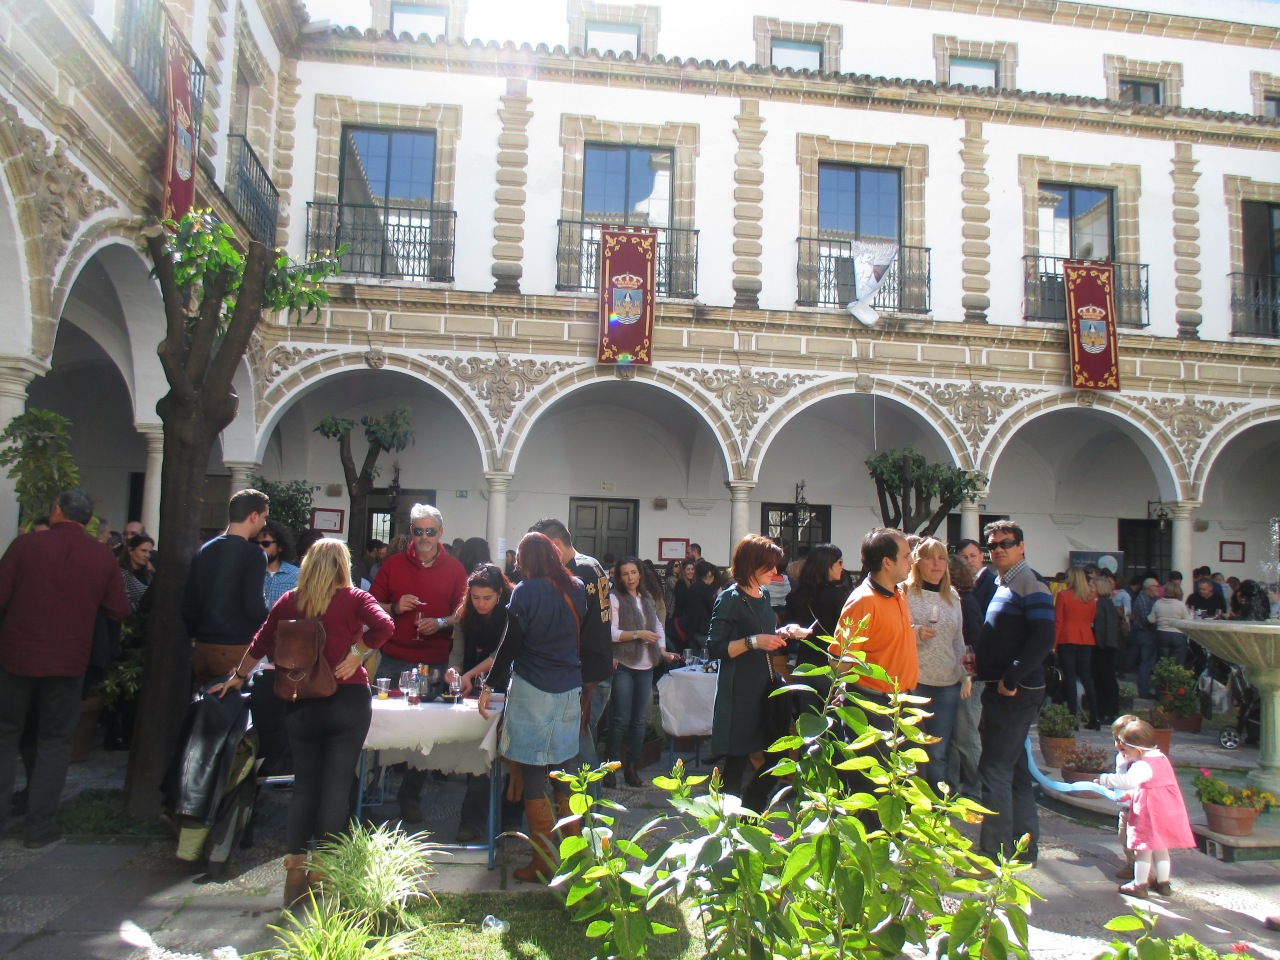 VI Muestra de Vinos de la Provincia de Cádiz. 6th Province of Cádiz WineShow